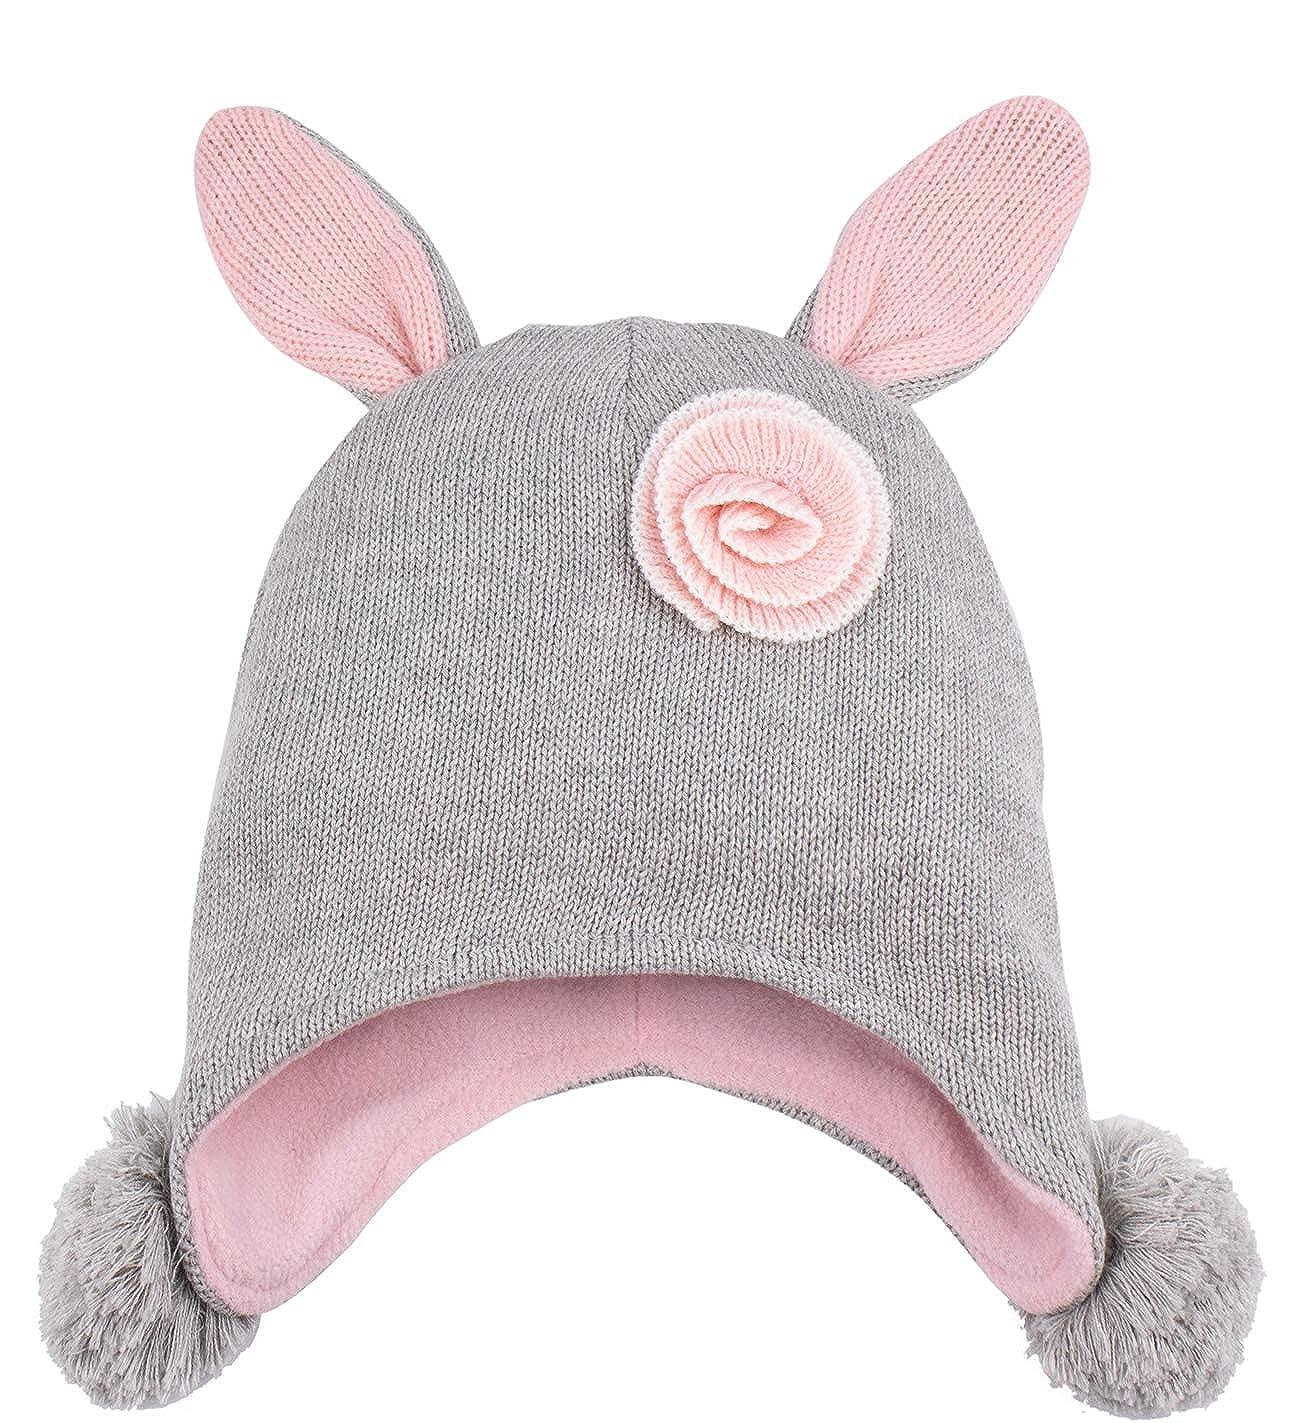 3fa36722259 Amazon.com  Eriso Toddler Girl Winter Bunny Hat Knit Rabbit Beanie Cap for  Baby  Clothing